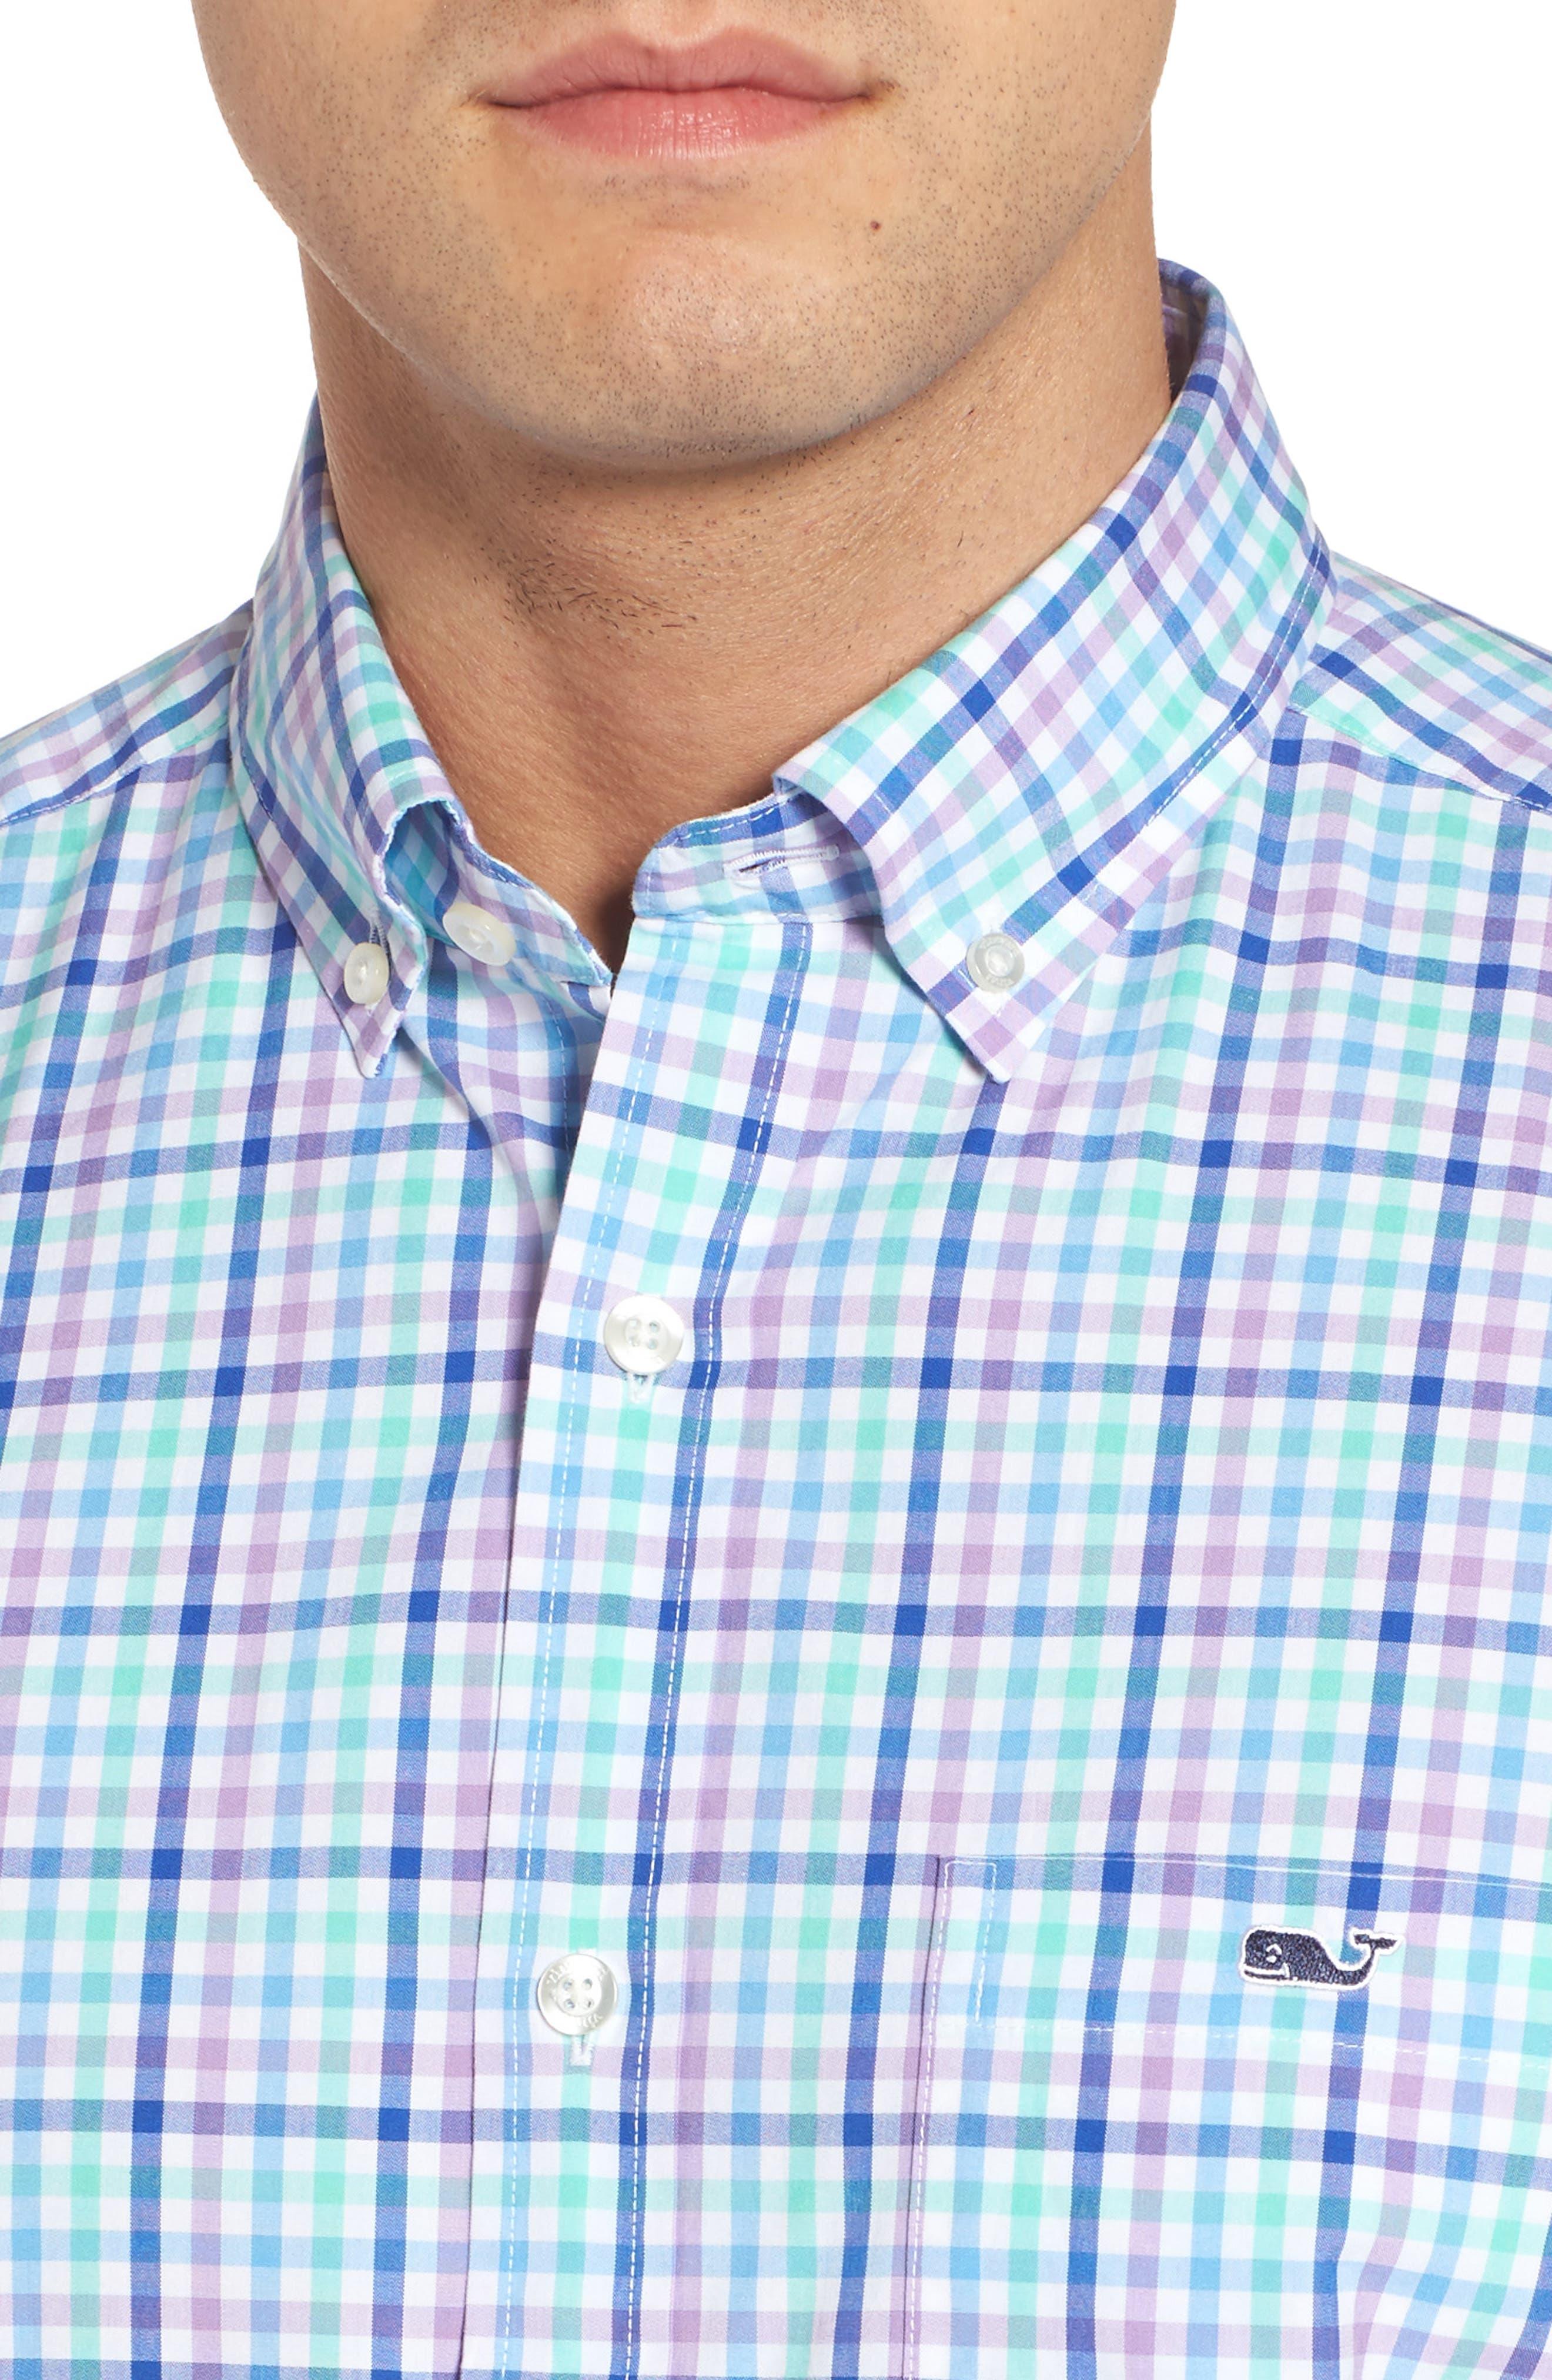 VINEYARD VINES,                             Tucker Gaspar Classic Fit Gingham Sport Shirt,                             Alternate thumbnail 4, color,                             359